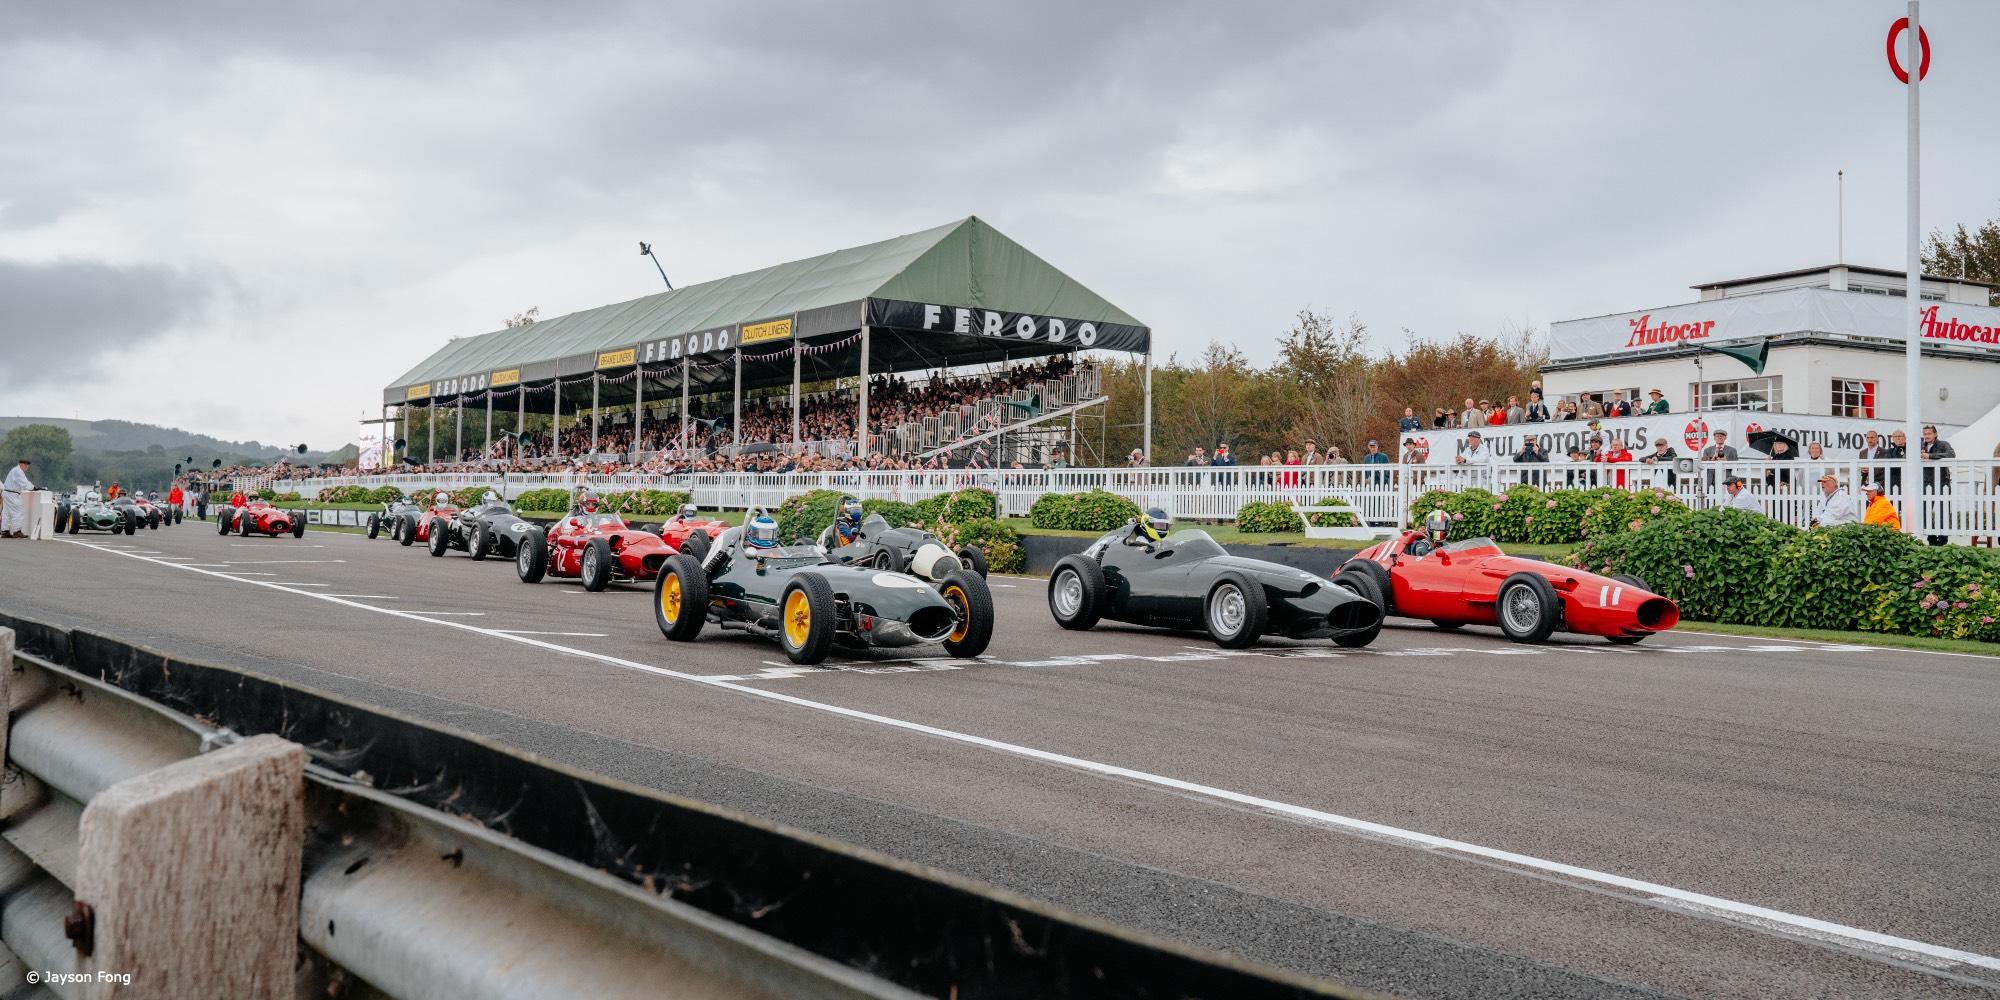 The 2021 Goodwood Revival Richmond Trophy Winning BRM P25 Formula 1